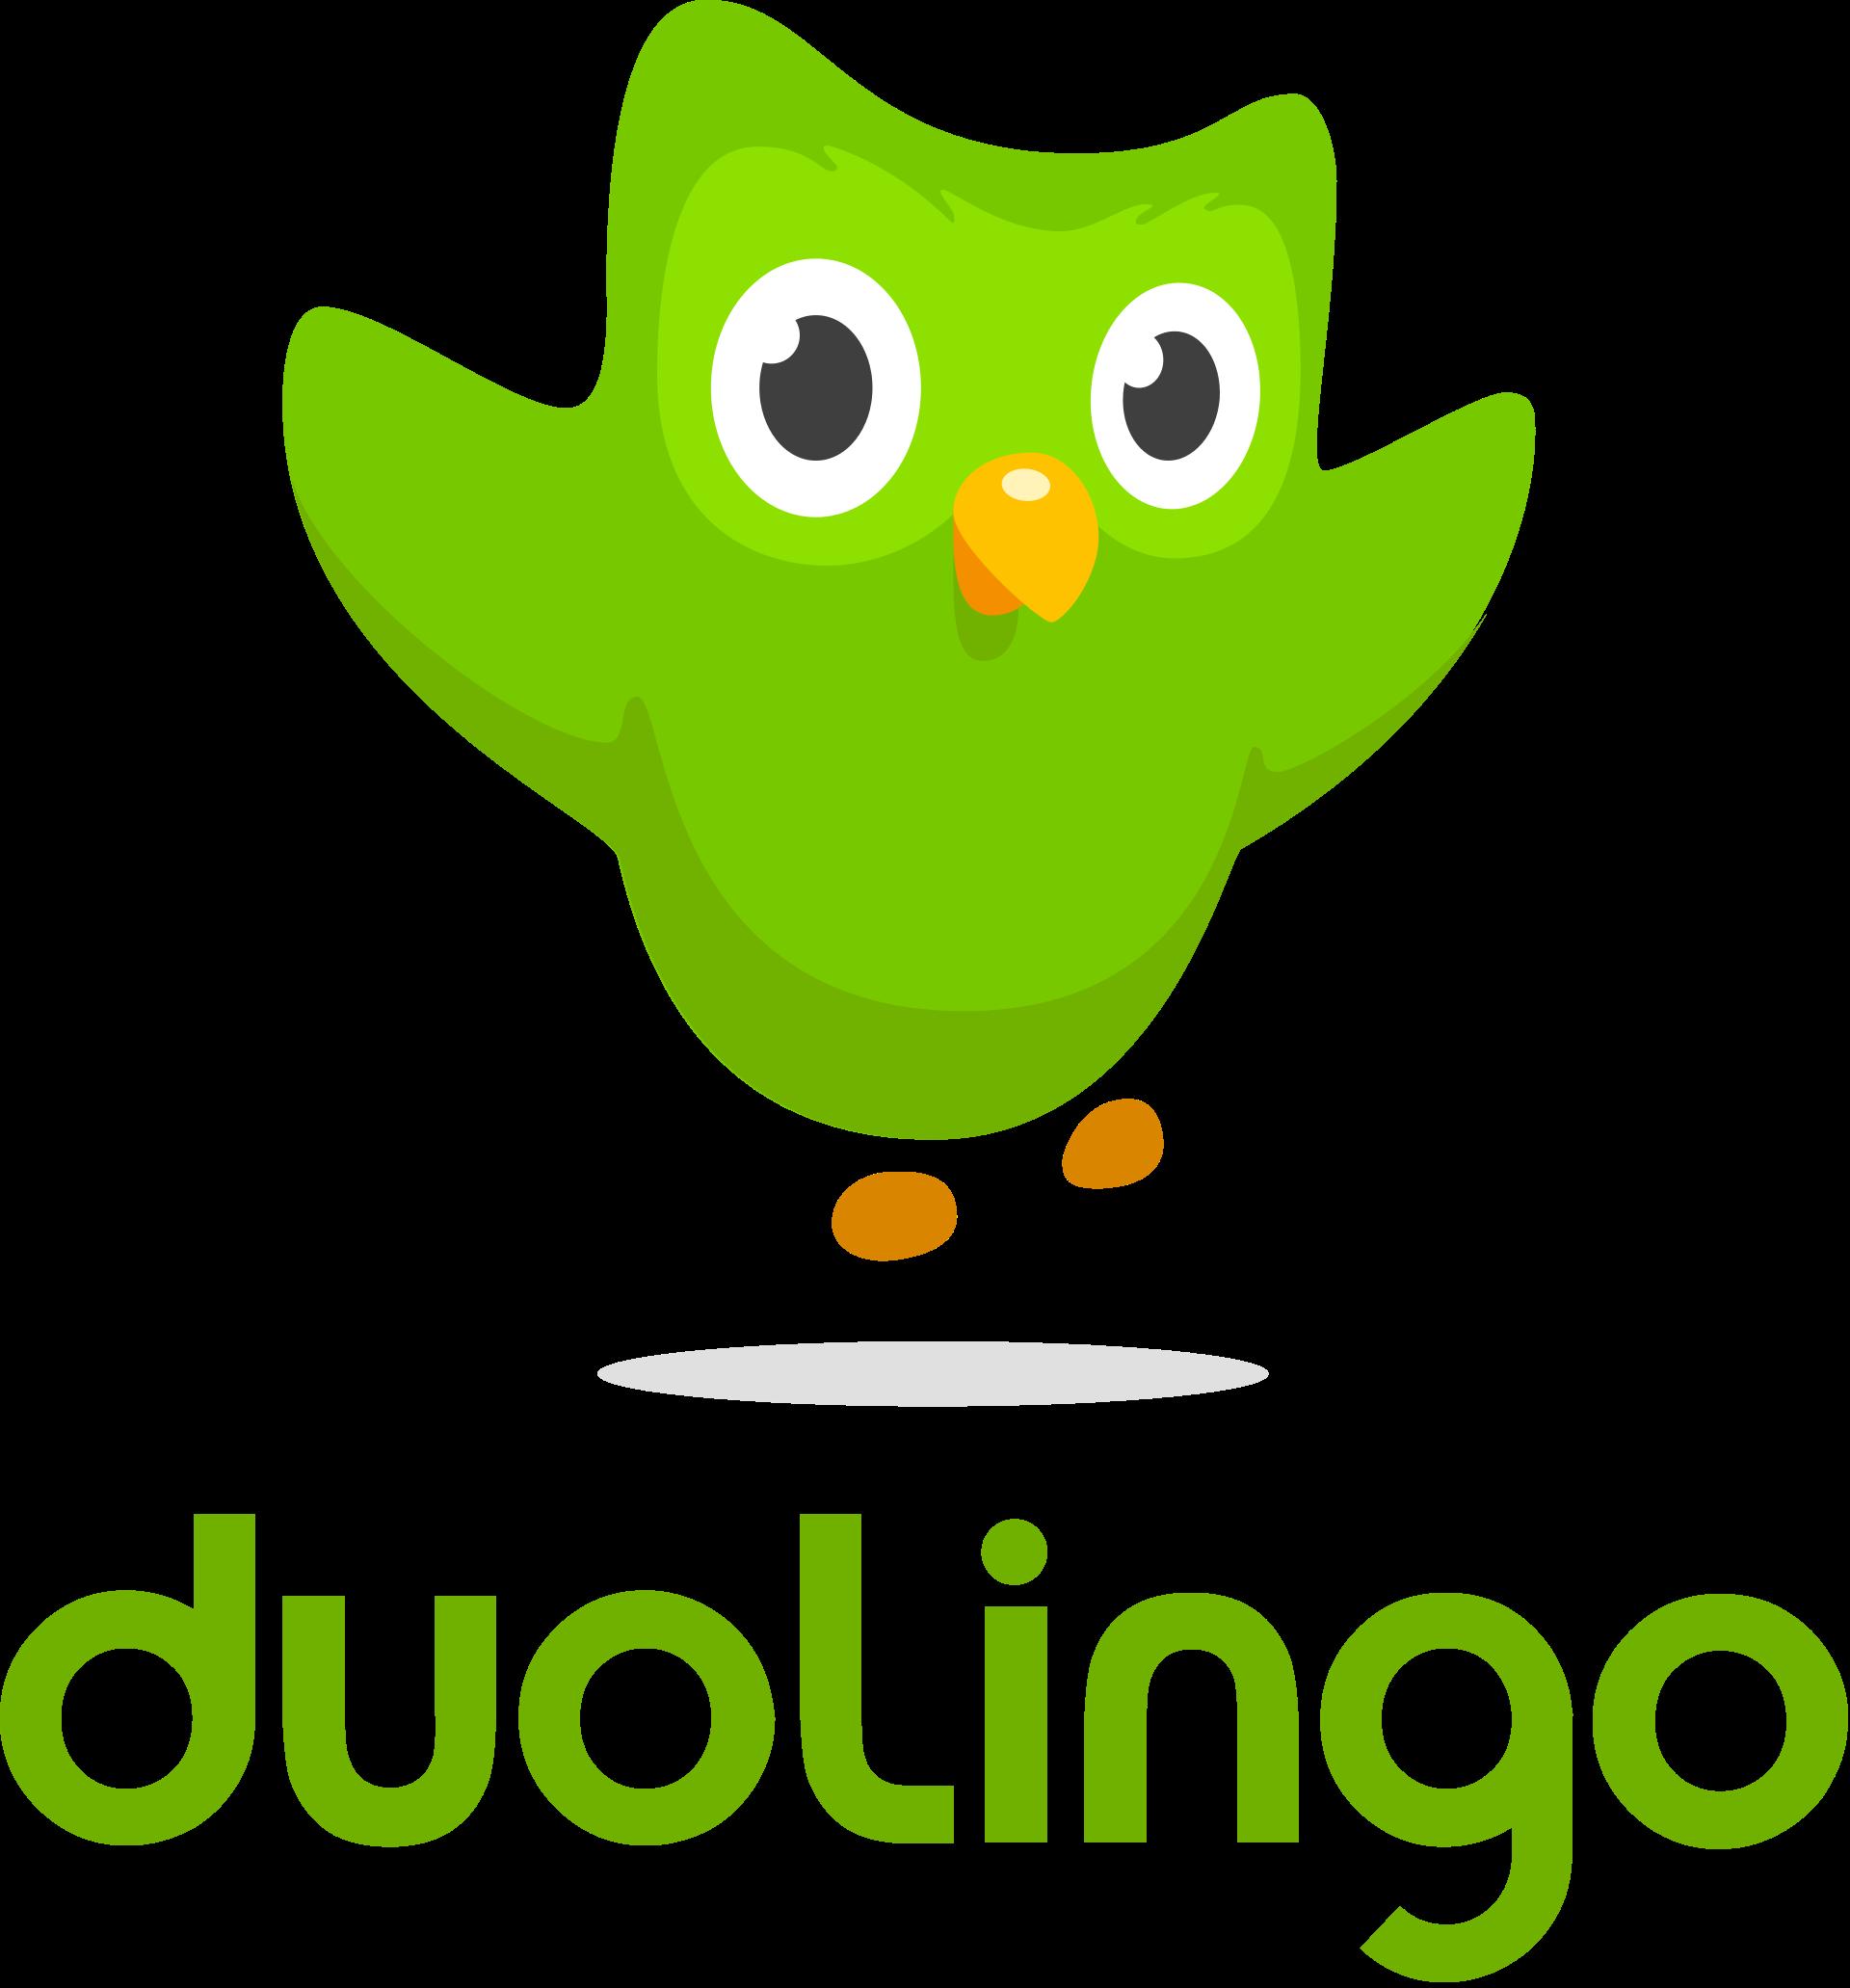 Duolingo_logo_with_owl.png